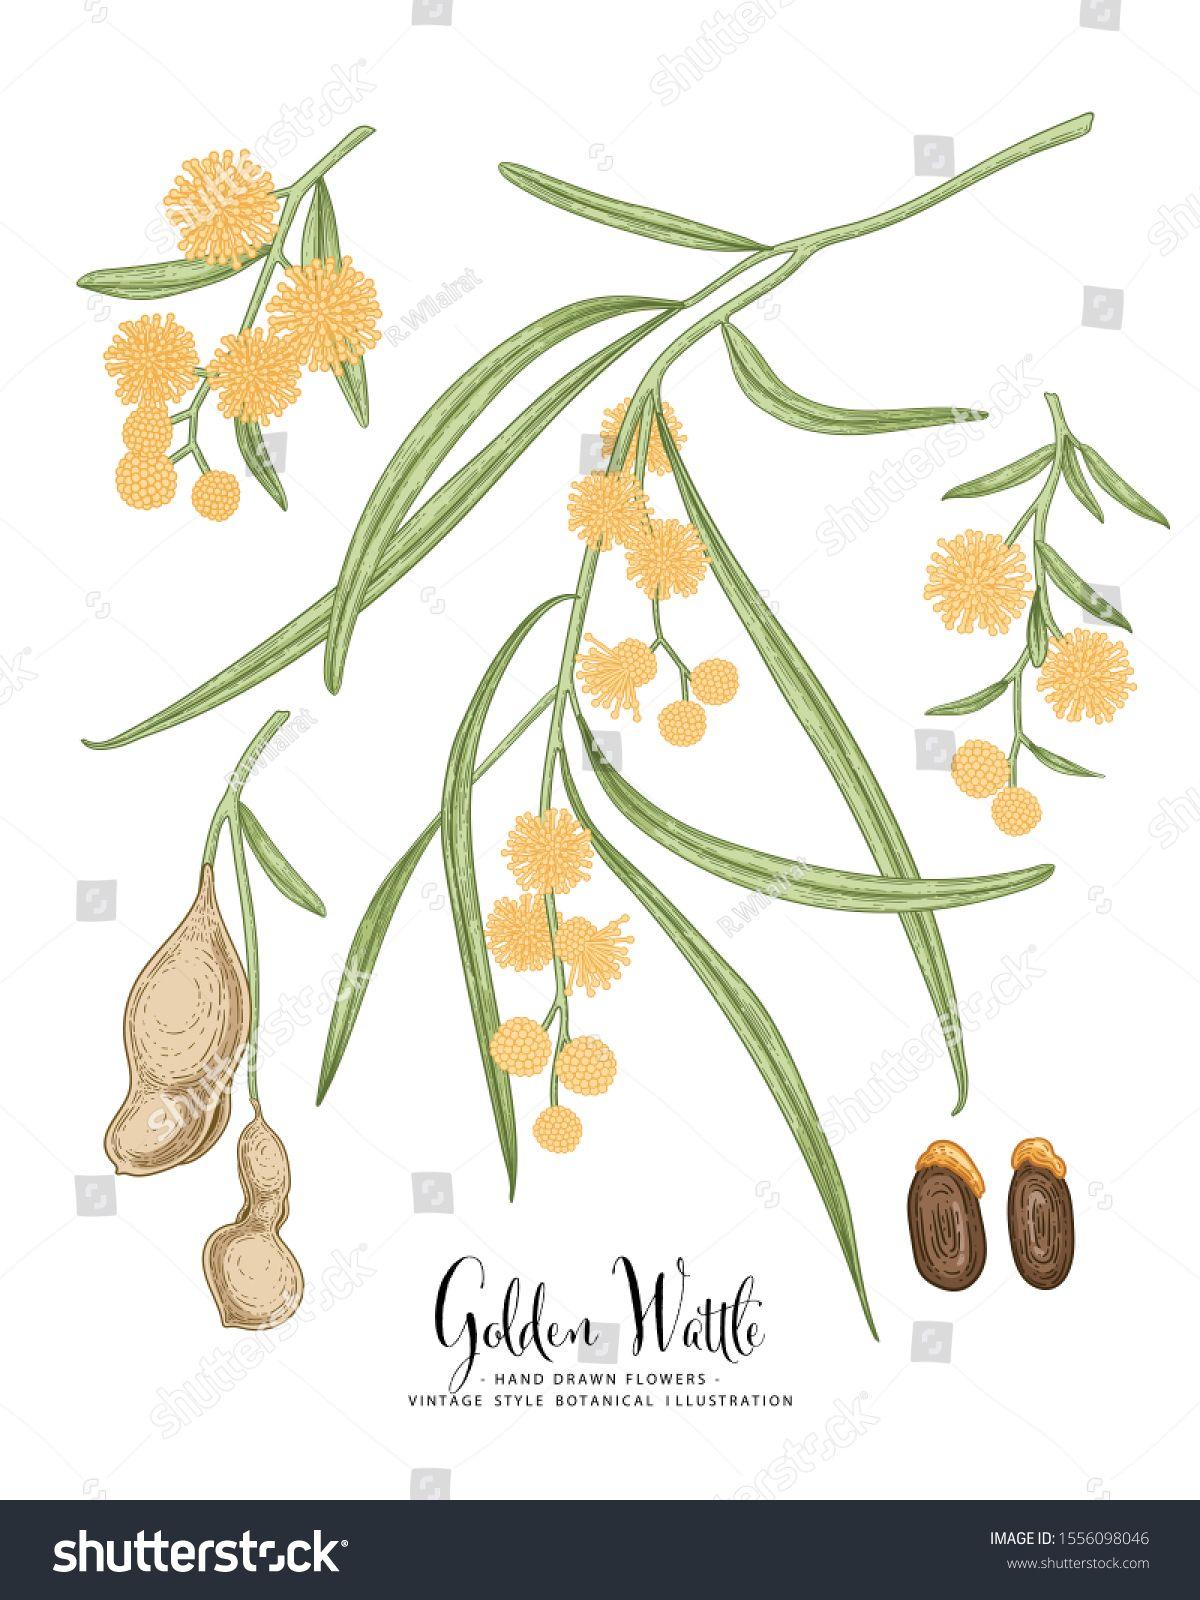 Vintage Botanical Illustration Golden Wattle Acacia Pycnantha Flower And Seed Pods Drawings Australia In 2020 Vintage Botanical Australian Native Flowers Botanical